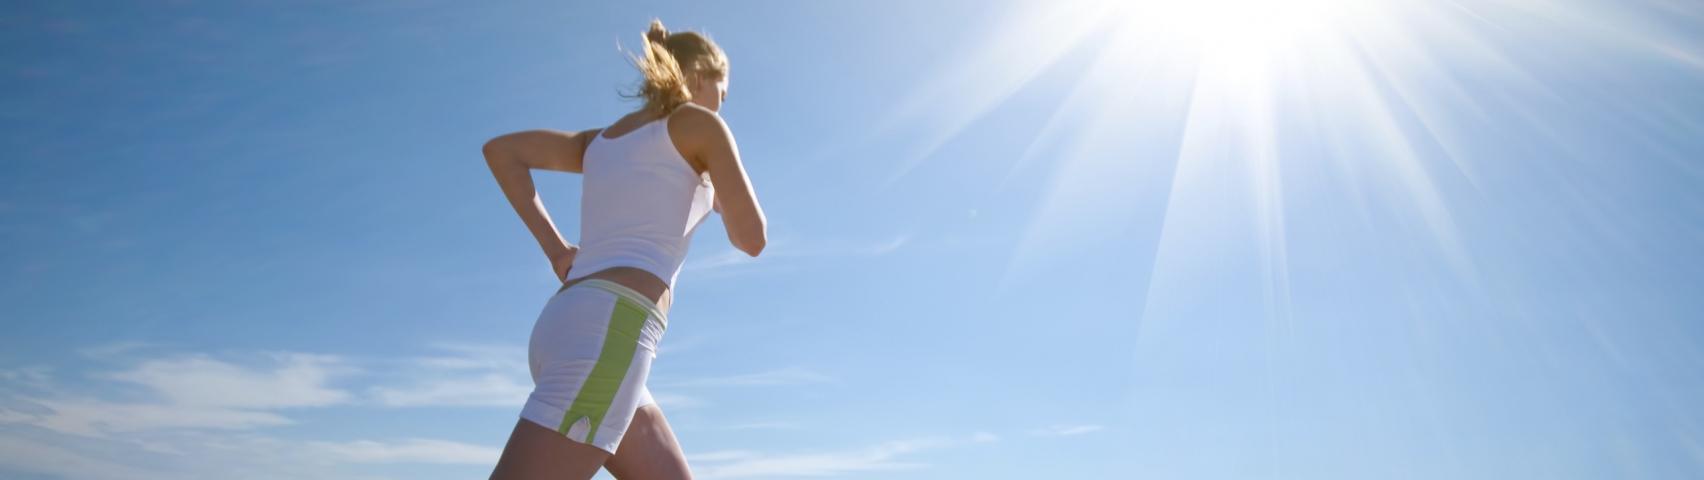 Women running on beach in sunshine